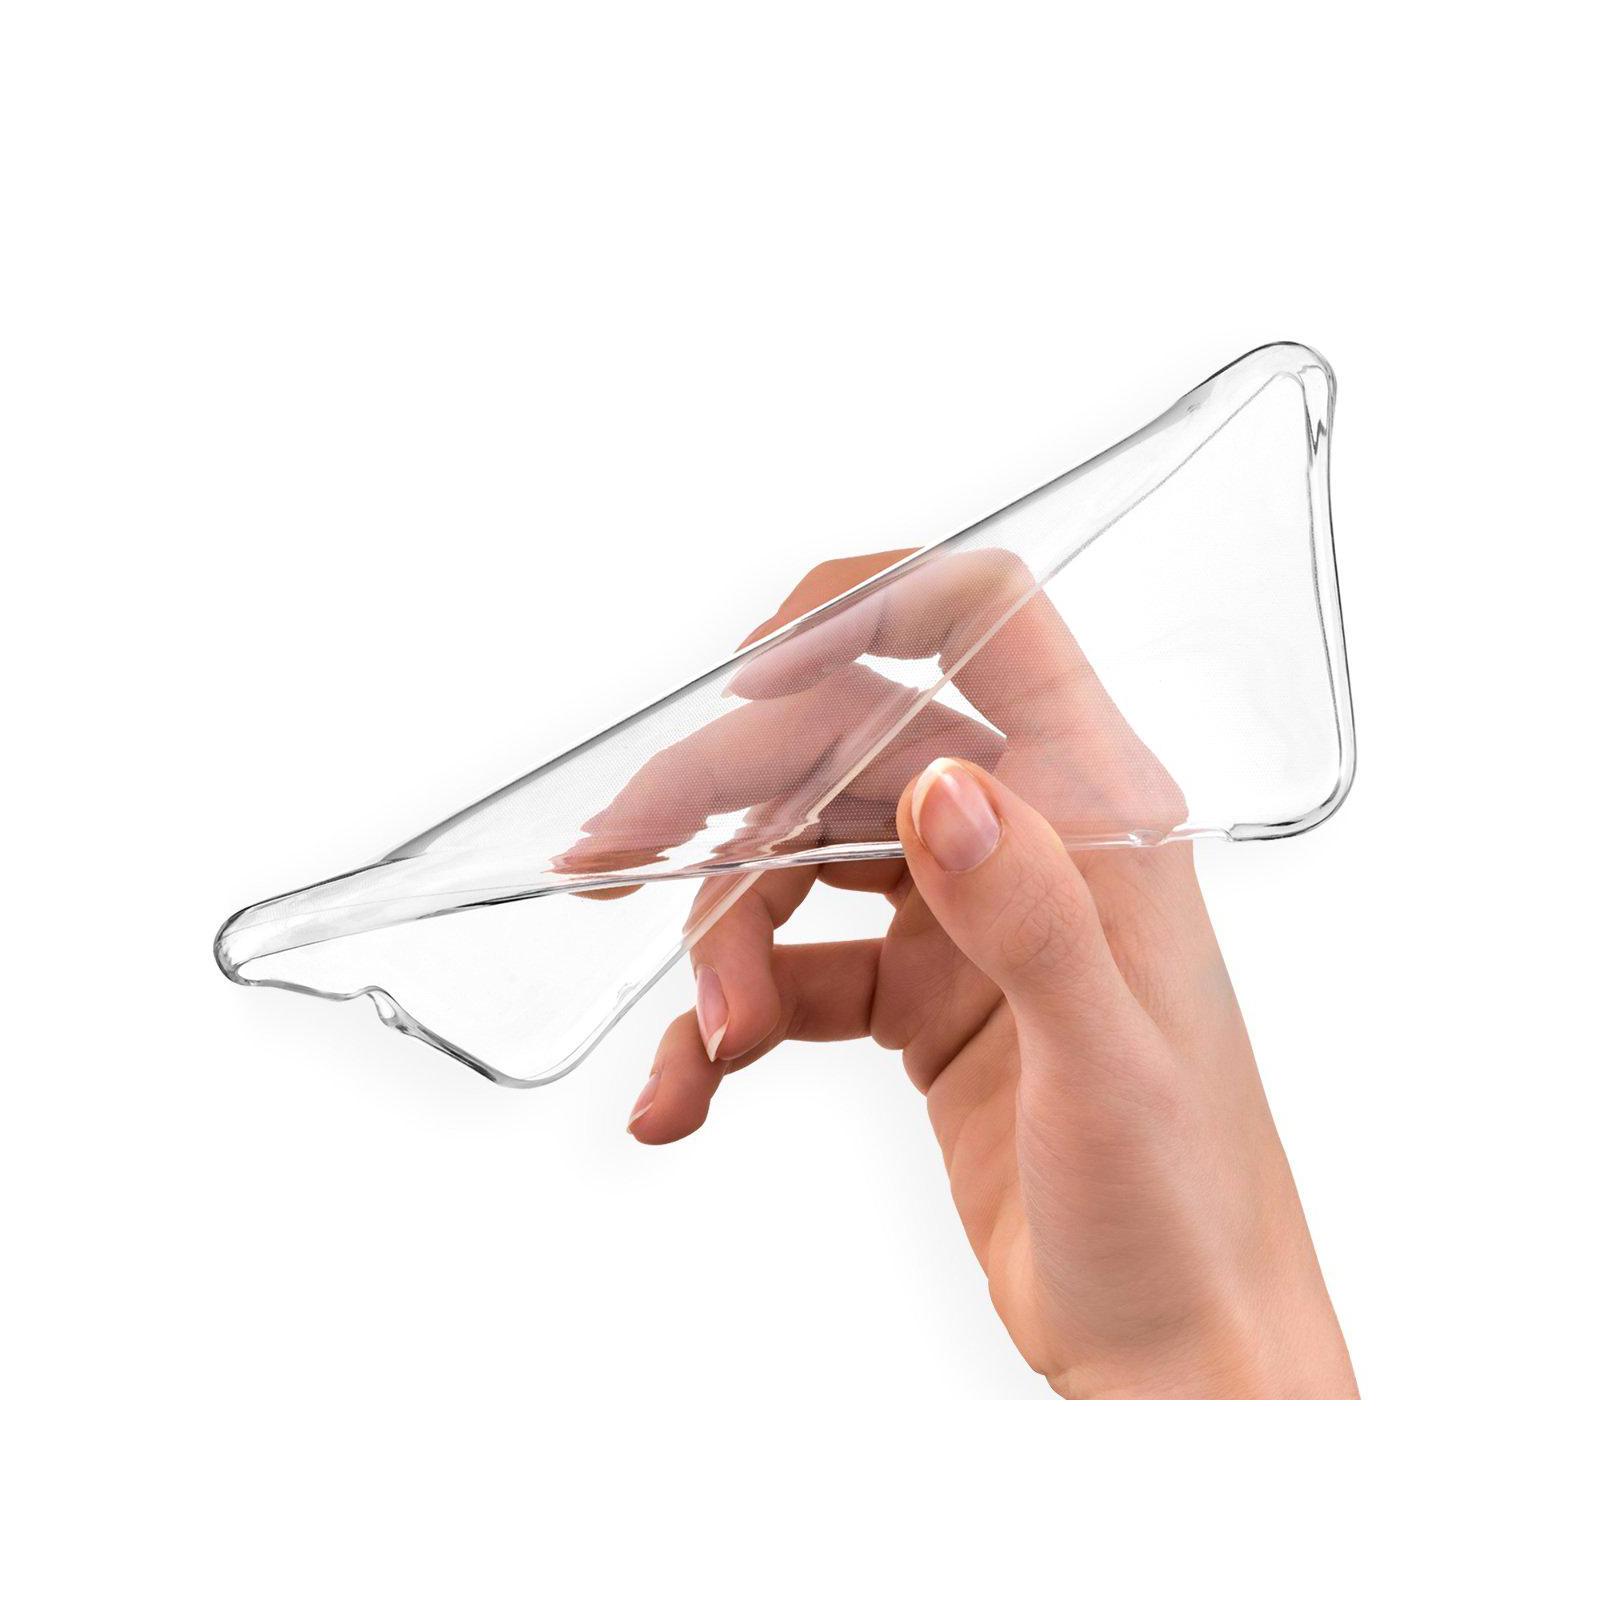 Чехол для моб. телефона Laudtec для Xiaomi Redmi 5A Clear tpu (Transperent) (LC-XR5A) изображение 9